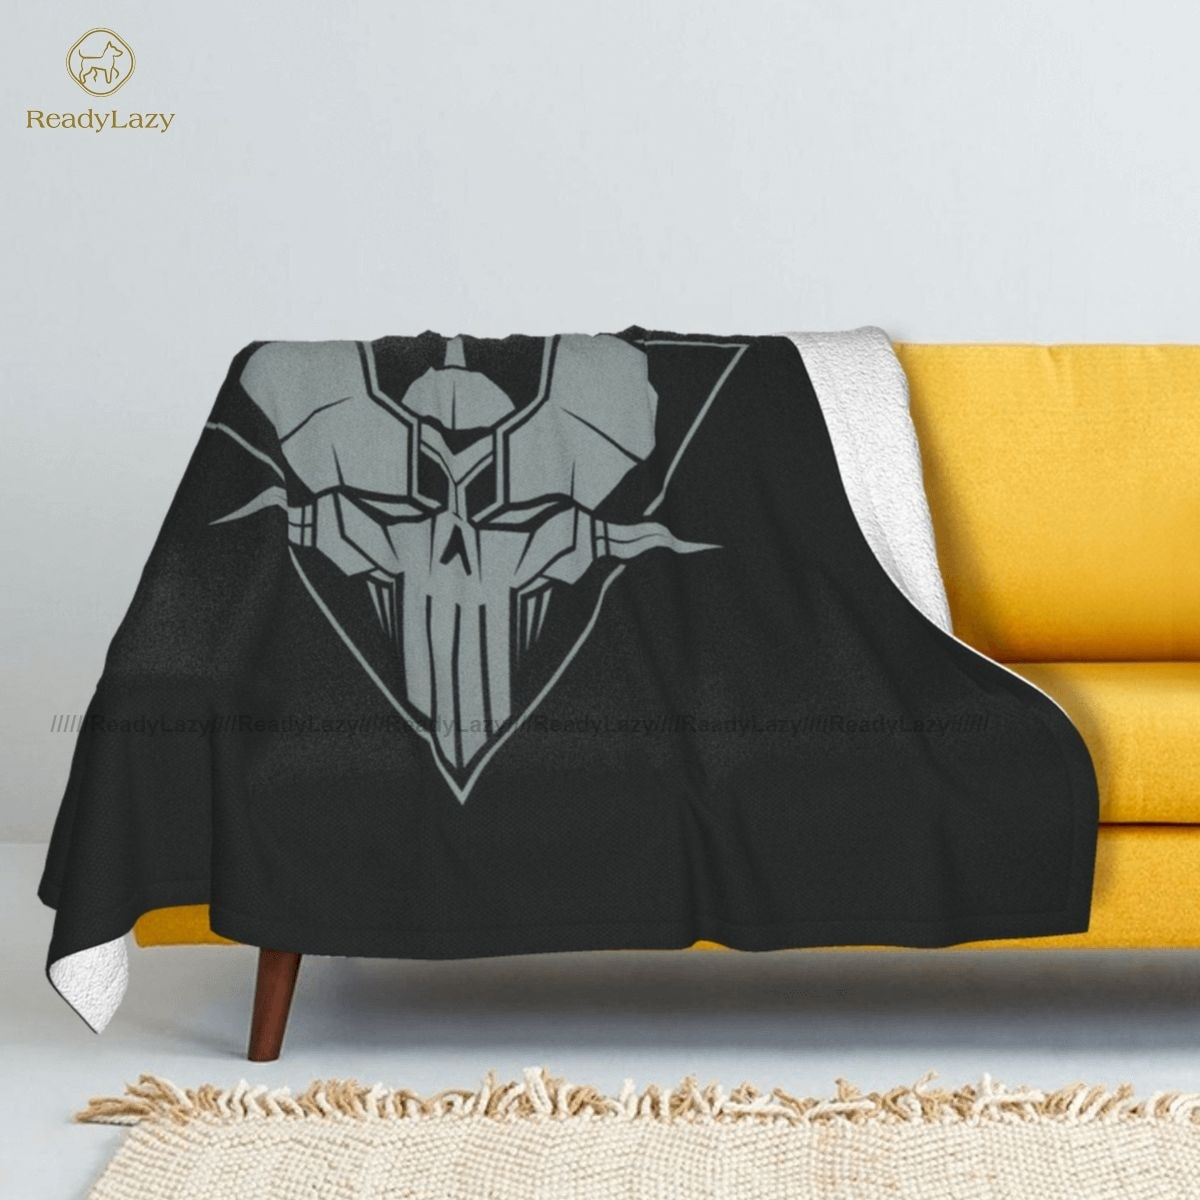 Mazinger Z-مفرش سرير من الصوف الناعم ، غطاء نوم عصري مزخرف